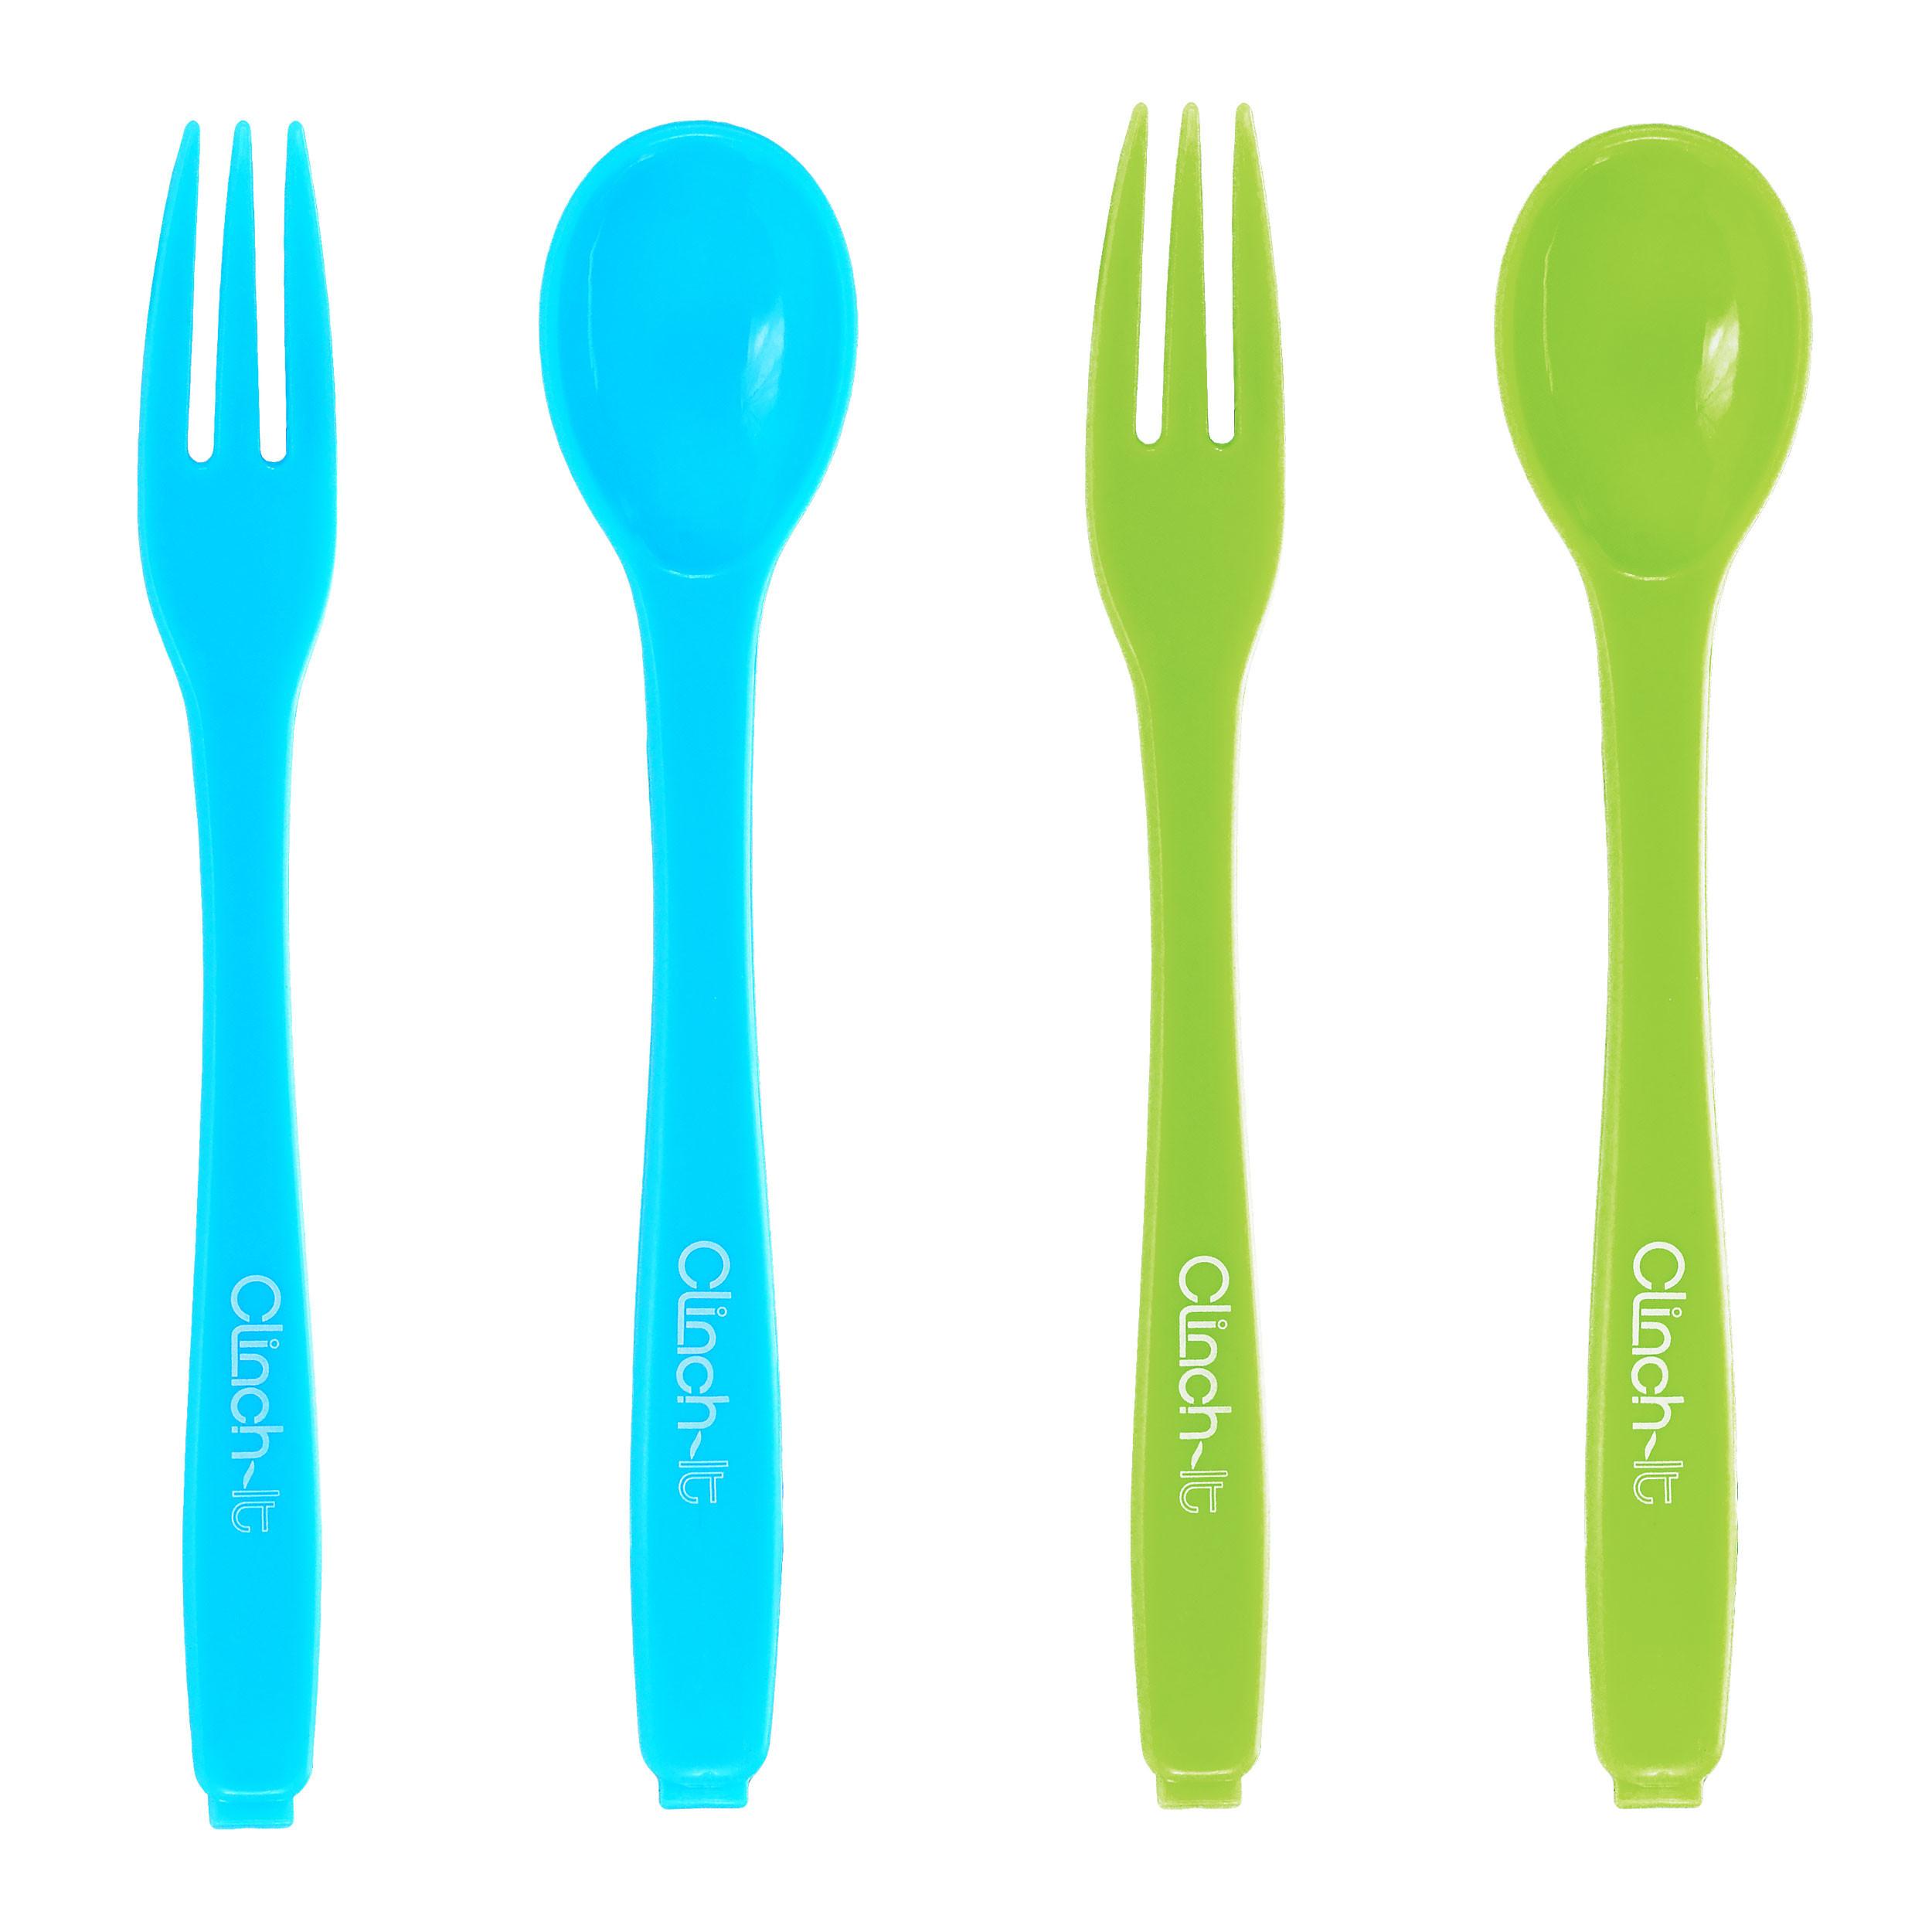 Spoon & Fork Bag Closure Clips, 4pc set